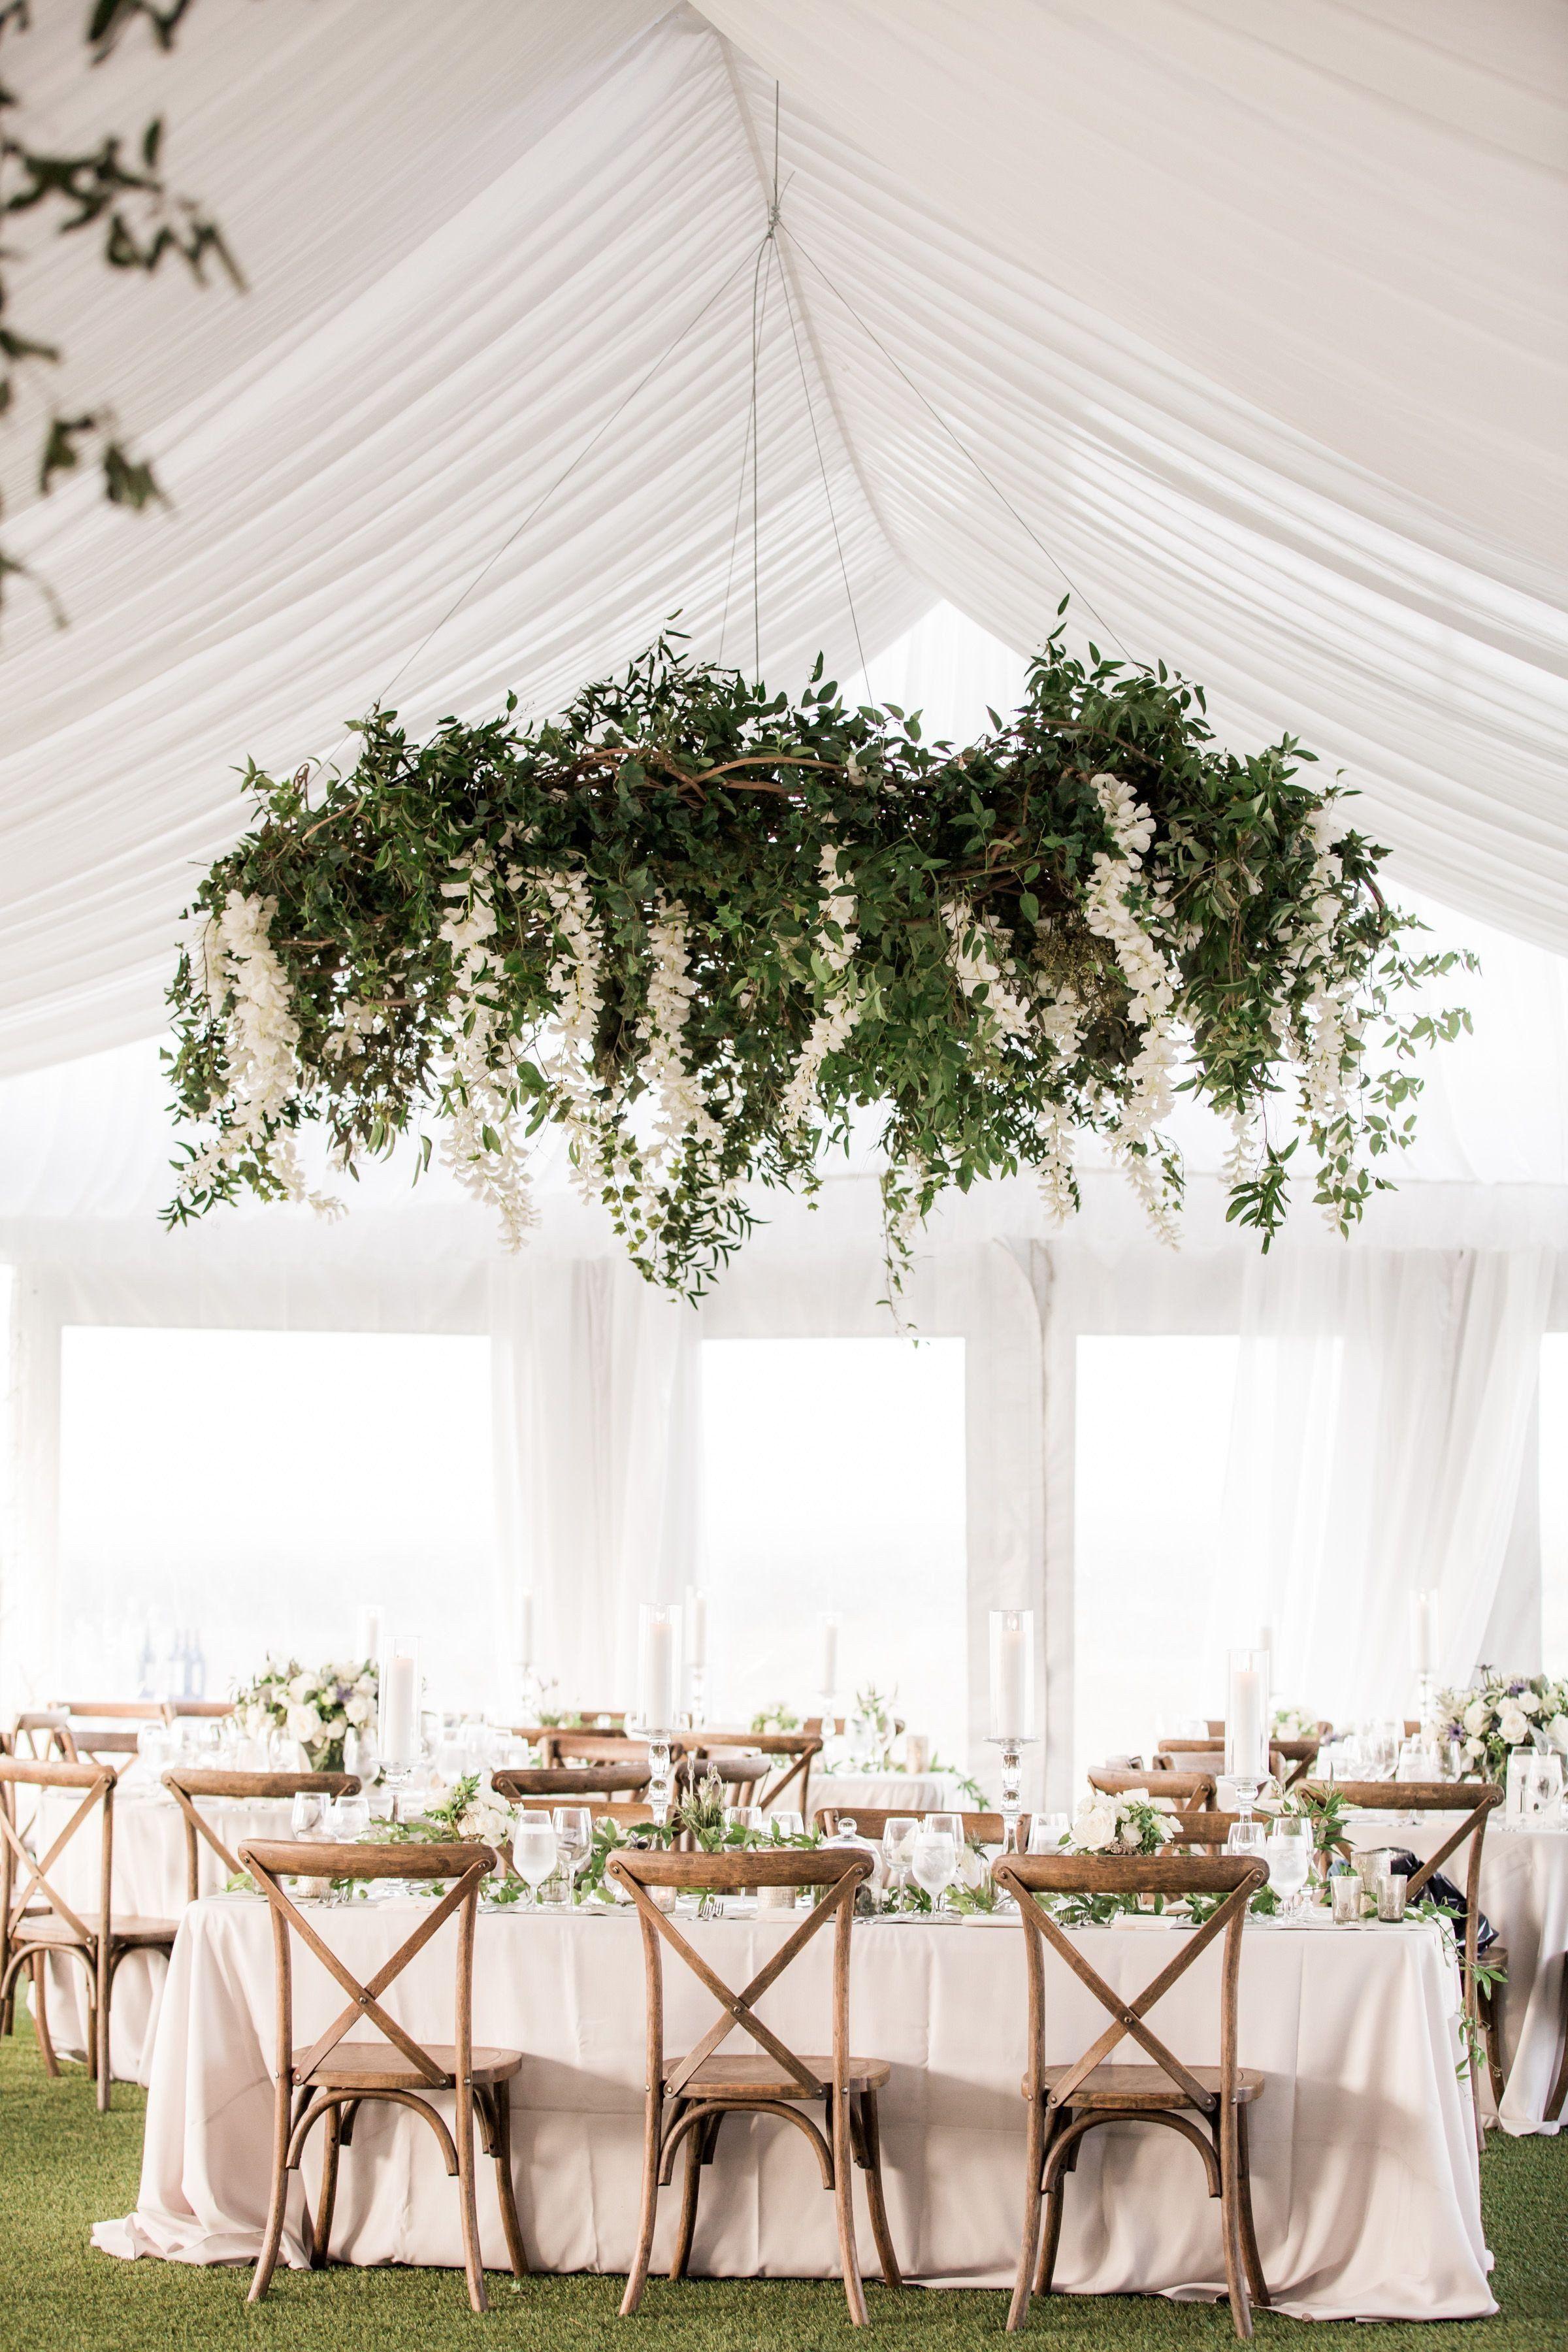 Wedding Decor Rentals Chicago Inspirational Hanging Floral Chandelier Floral Design By Winston Flowers Wedding Chandelier Wedding Ceiling Wedding Rentals Decor